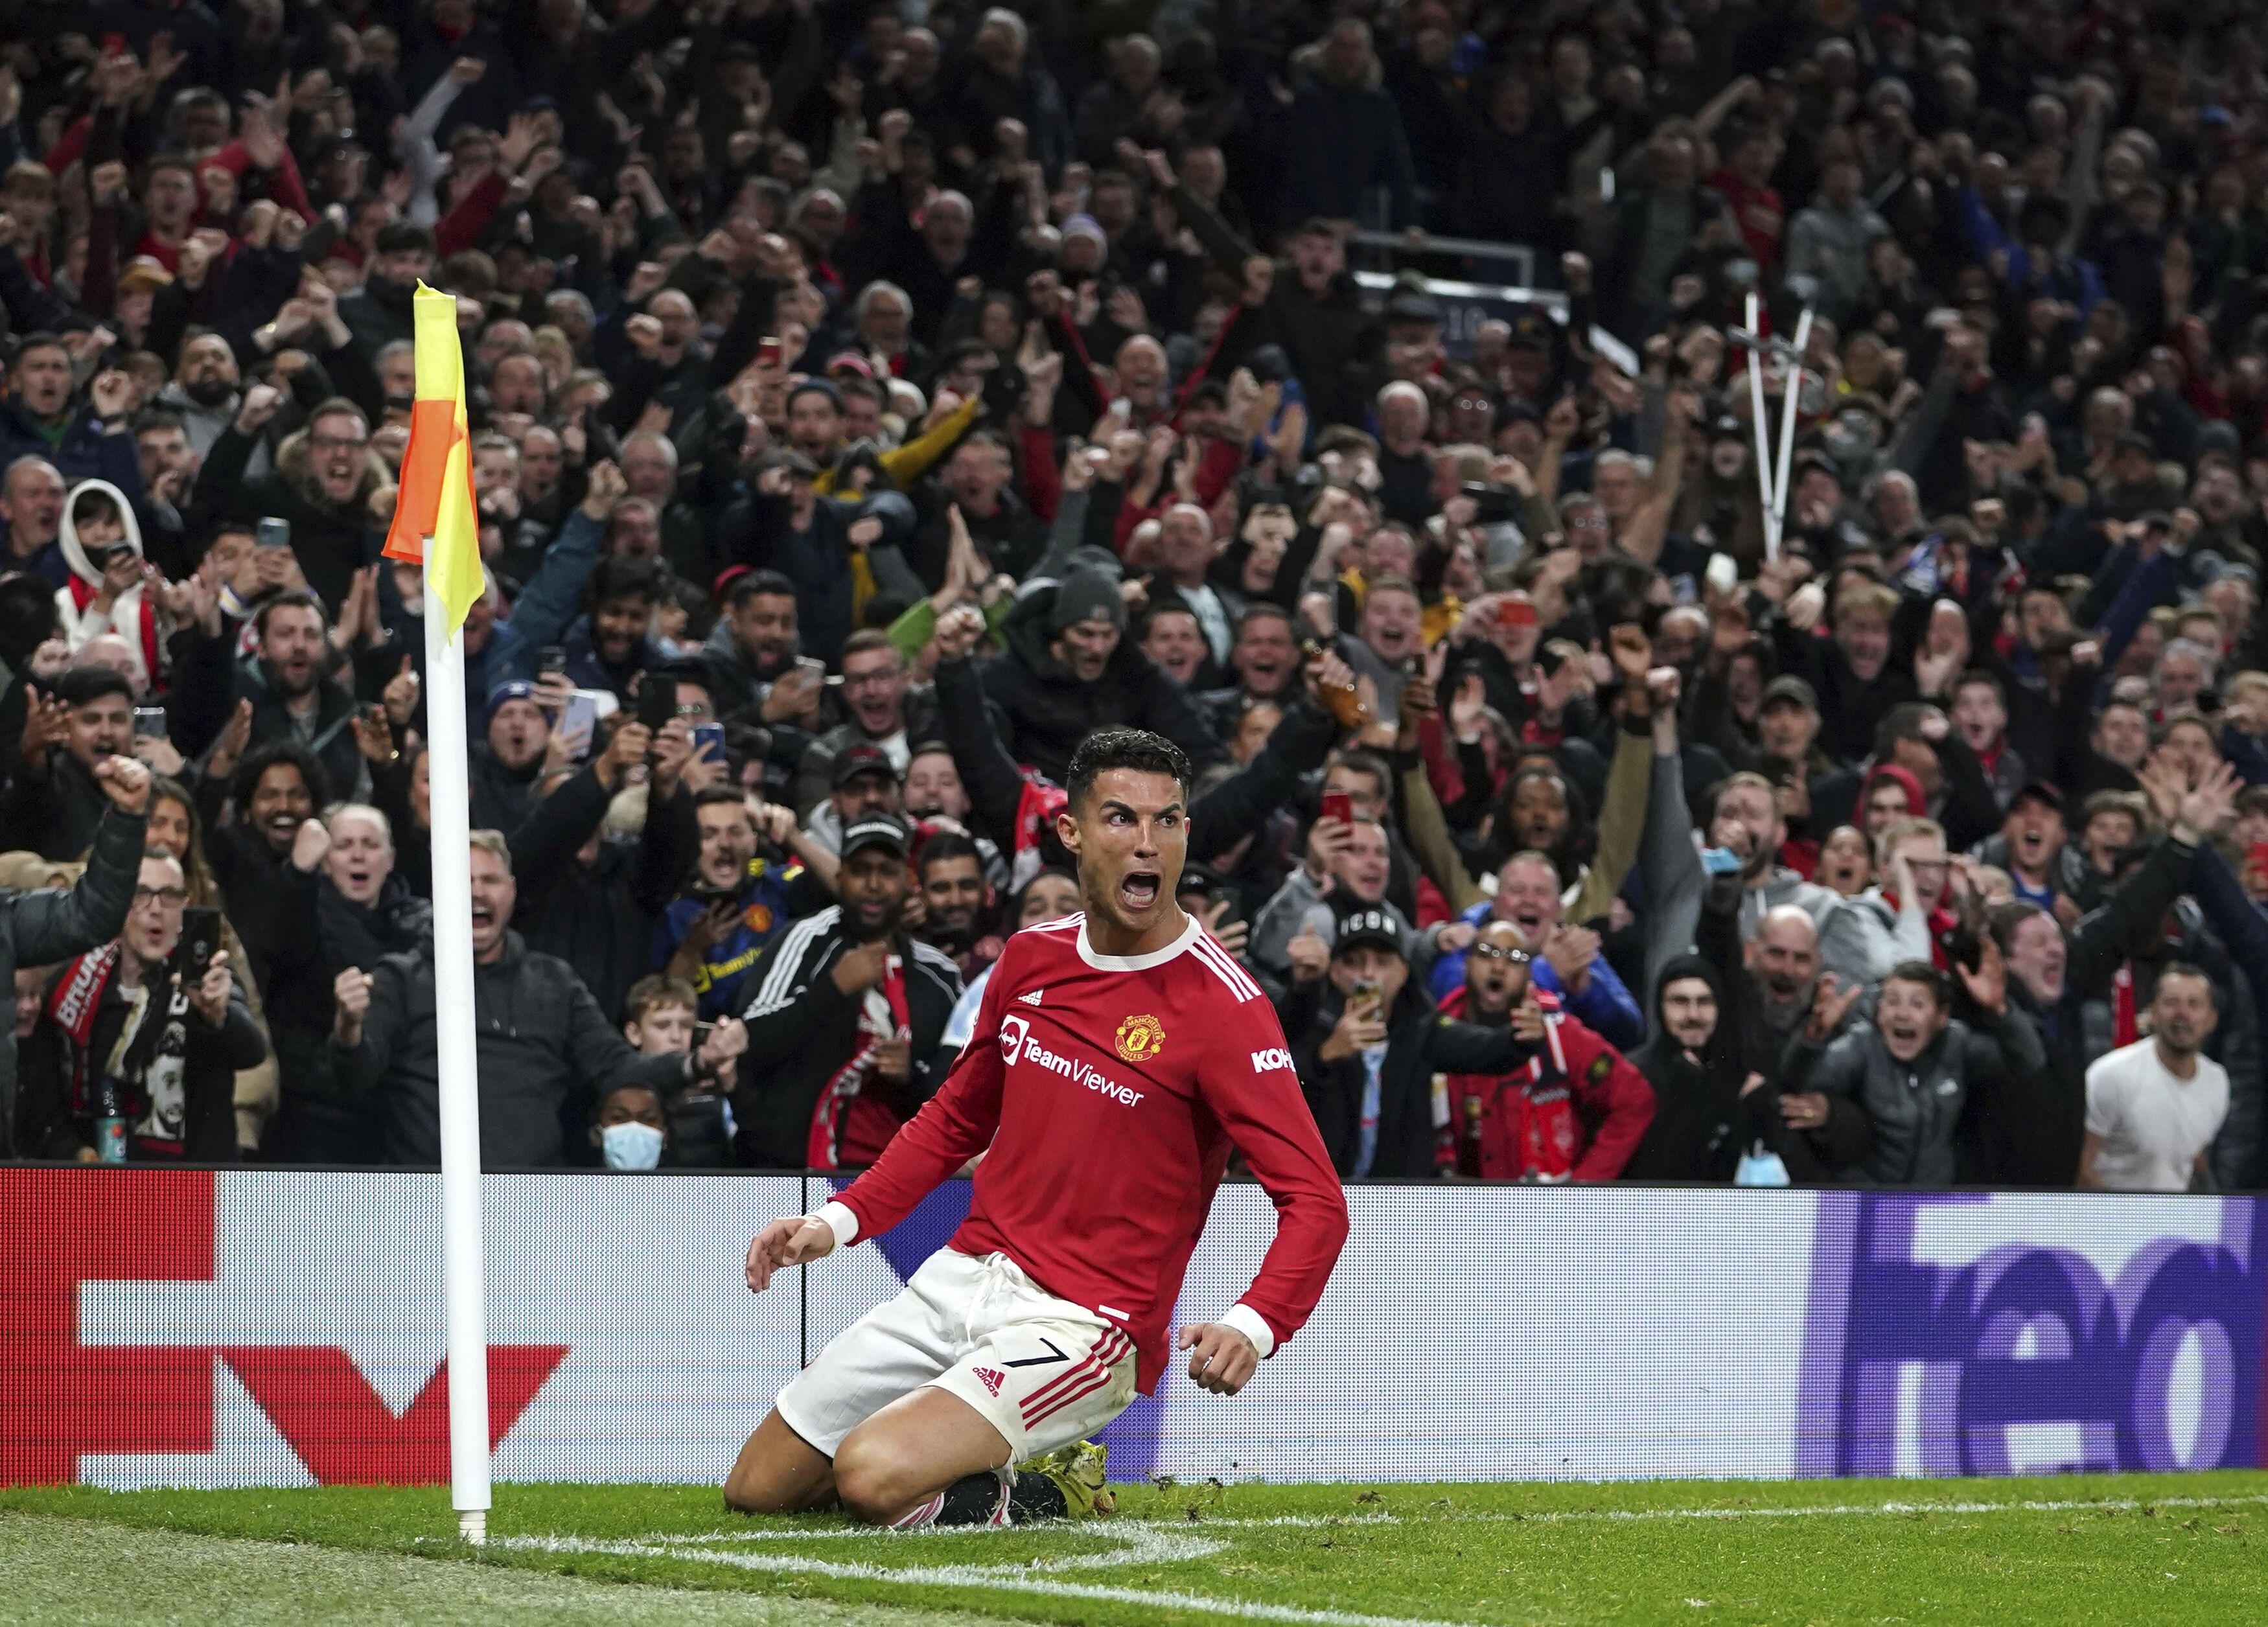 otro gol de cristiano salva al united en la champions